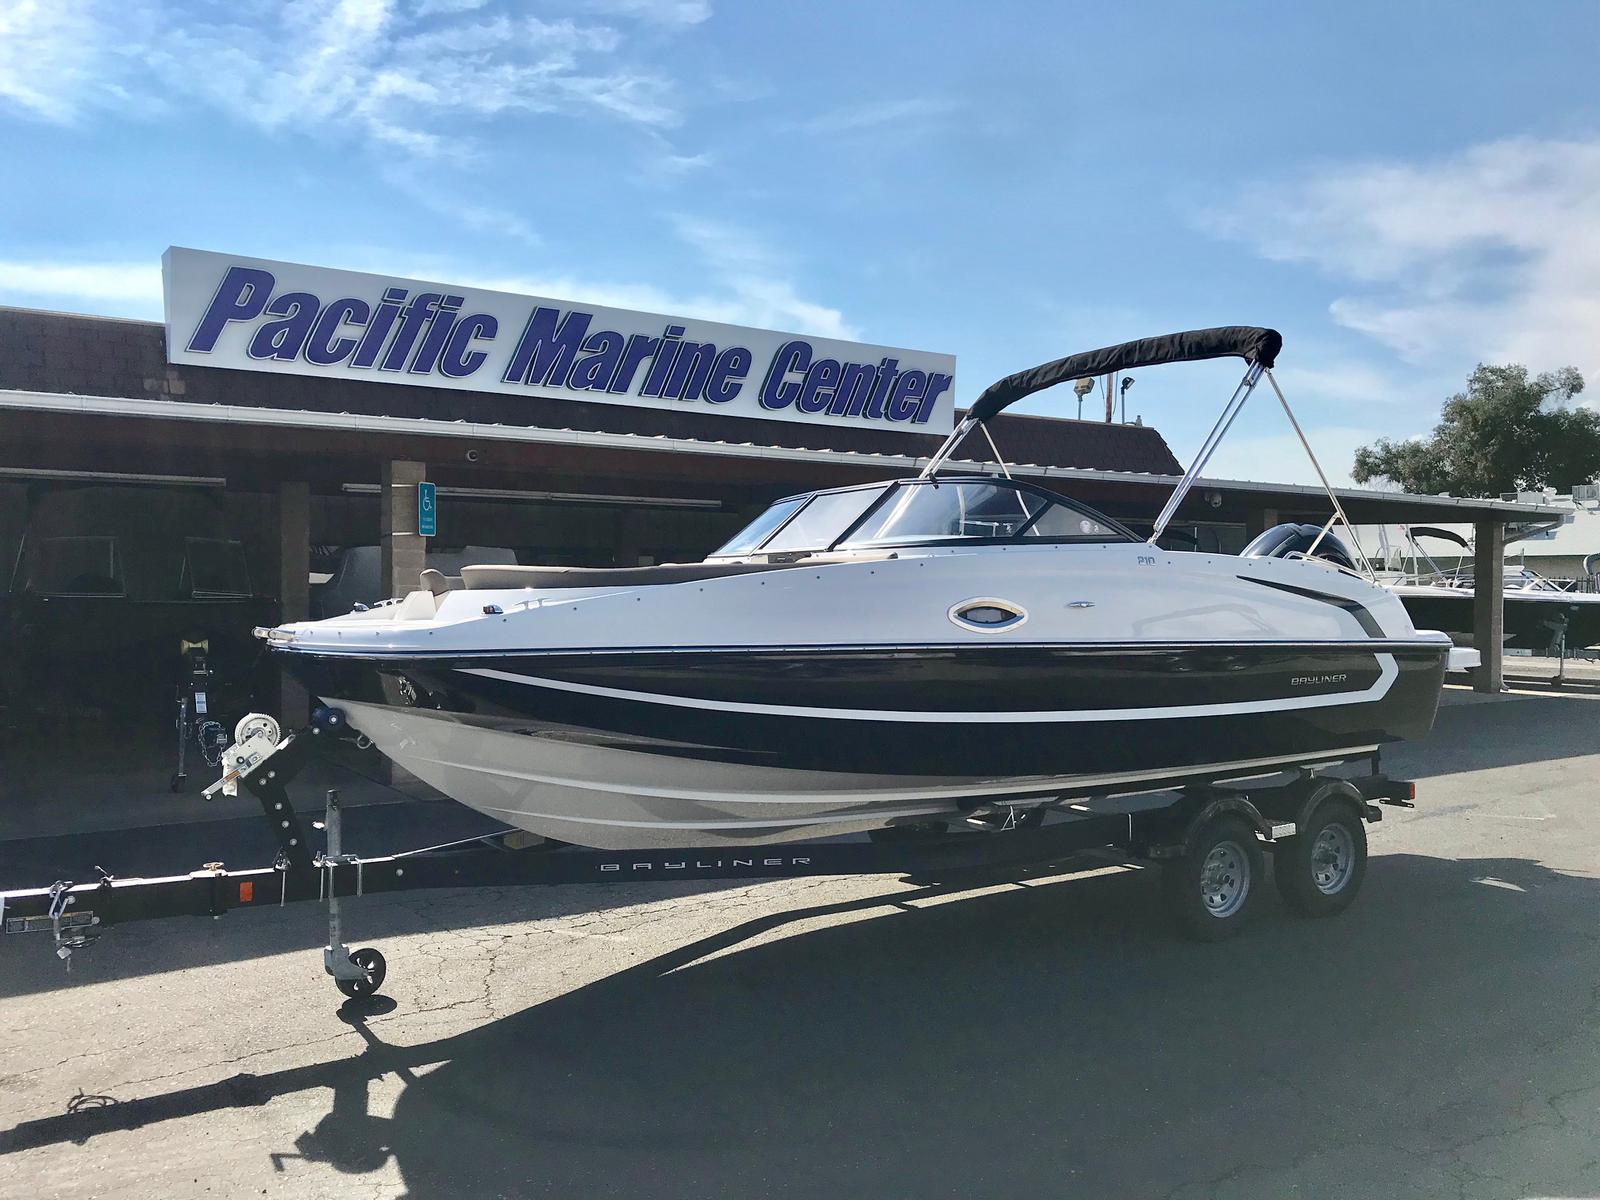 Bayliner 210 Deck Boat w/ 150 HP Mercury!